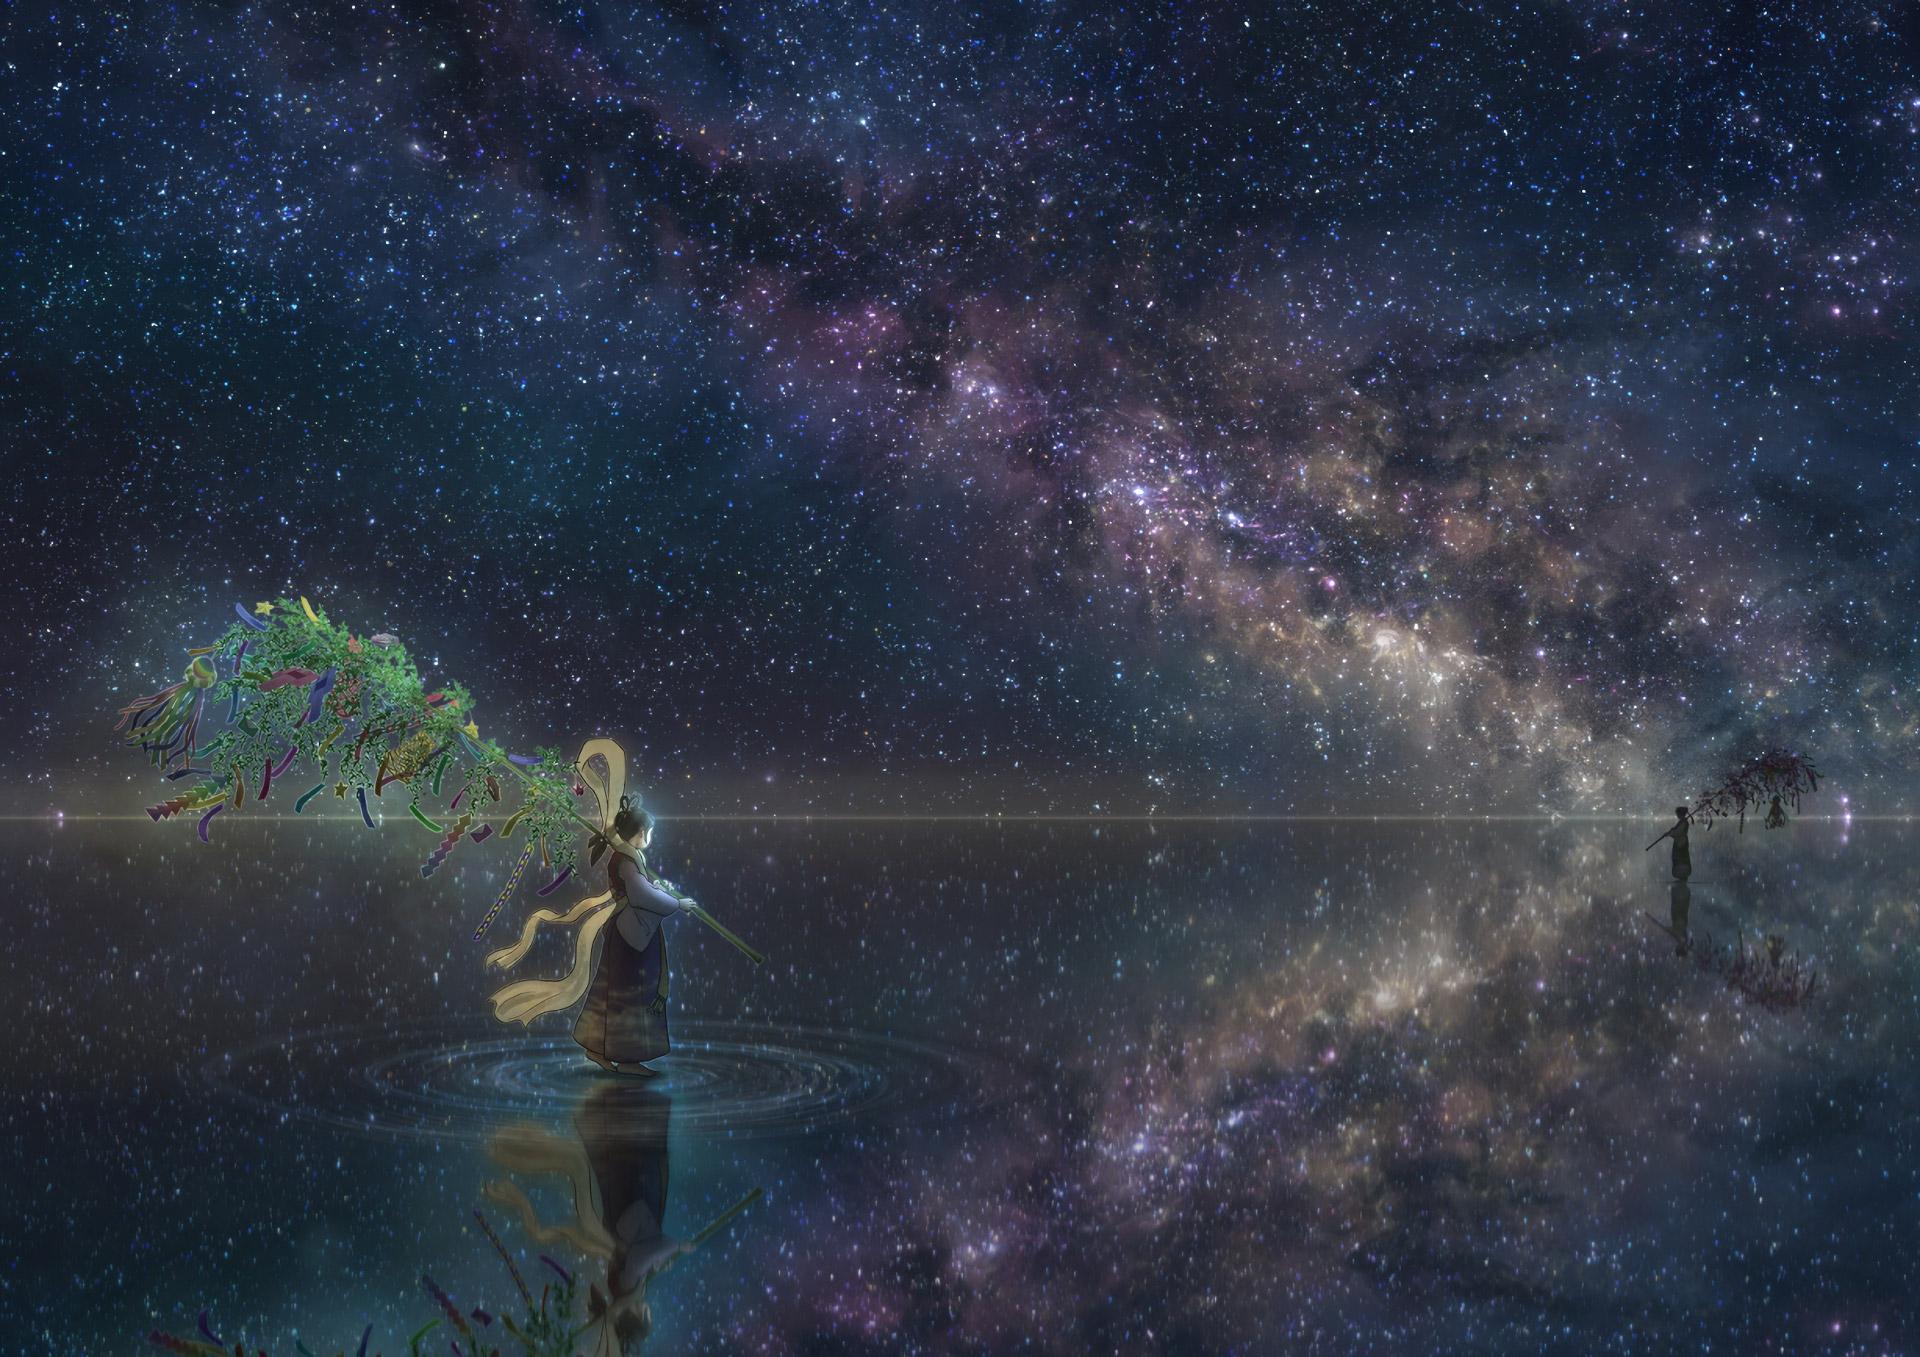 Animated Lonely Boy Wallpapers Anime Girl Horizon Night Reflection Stars Hd Anime 4k